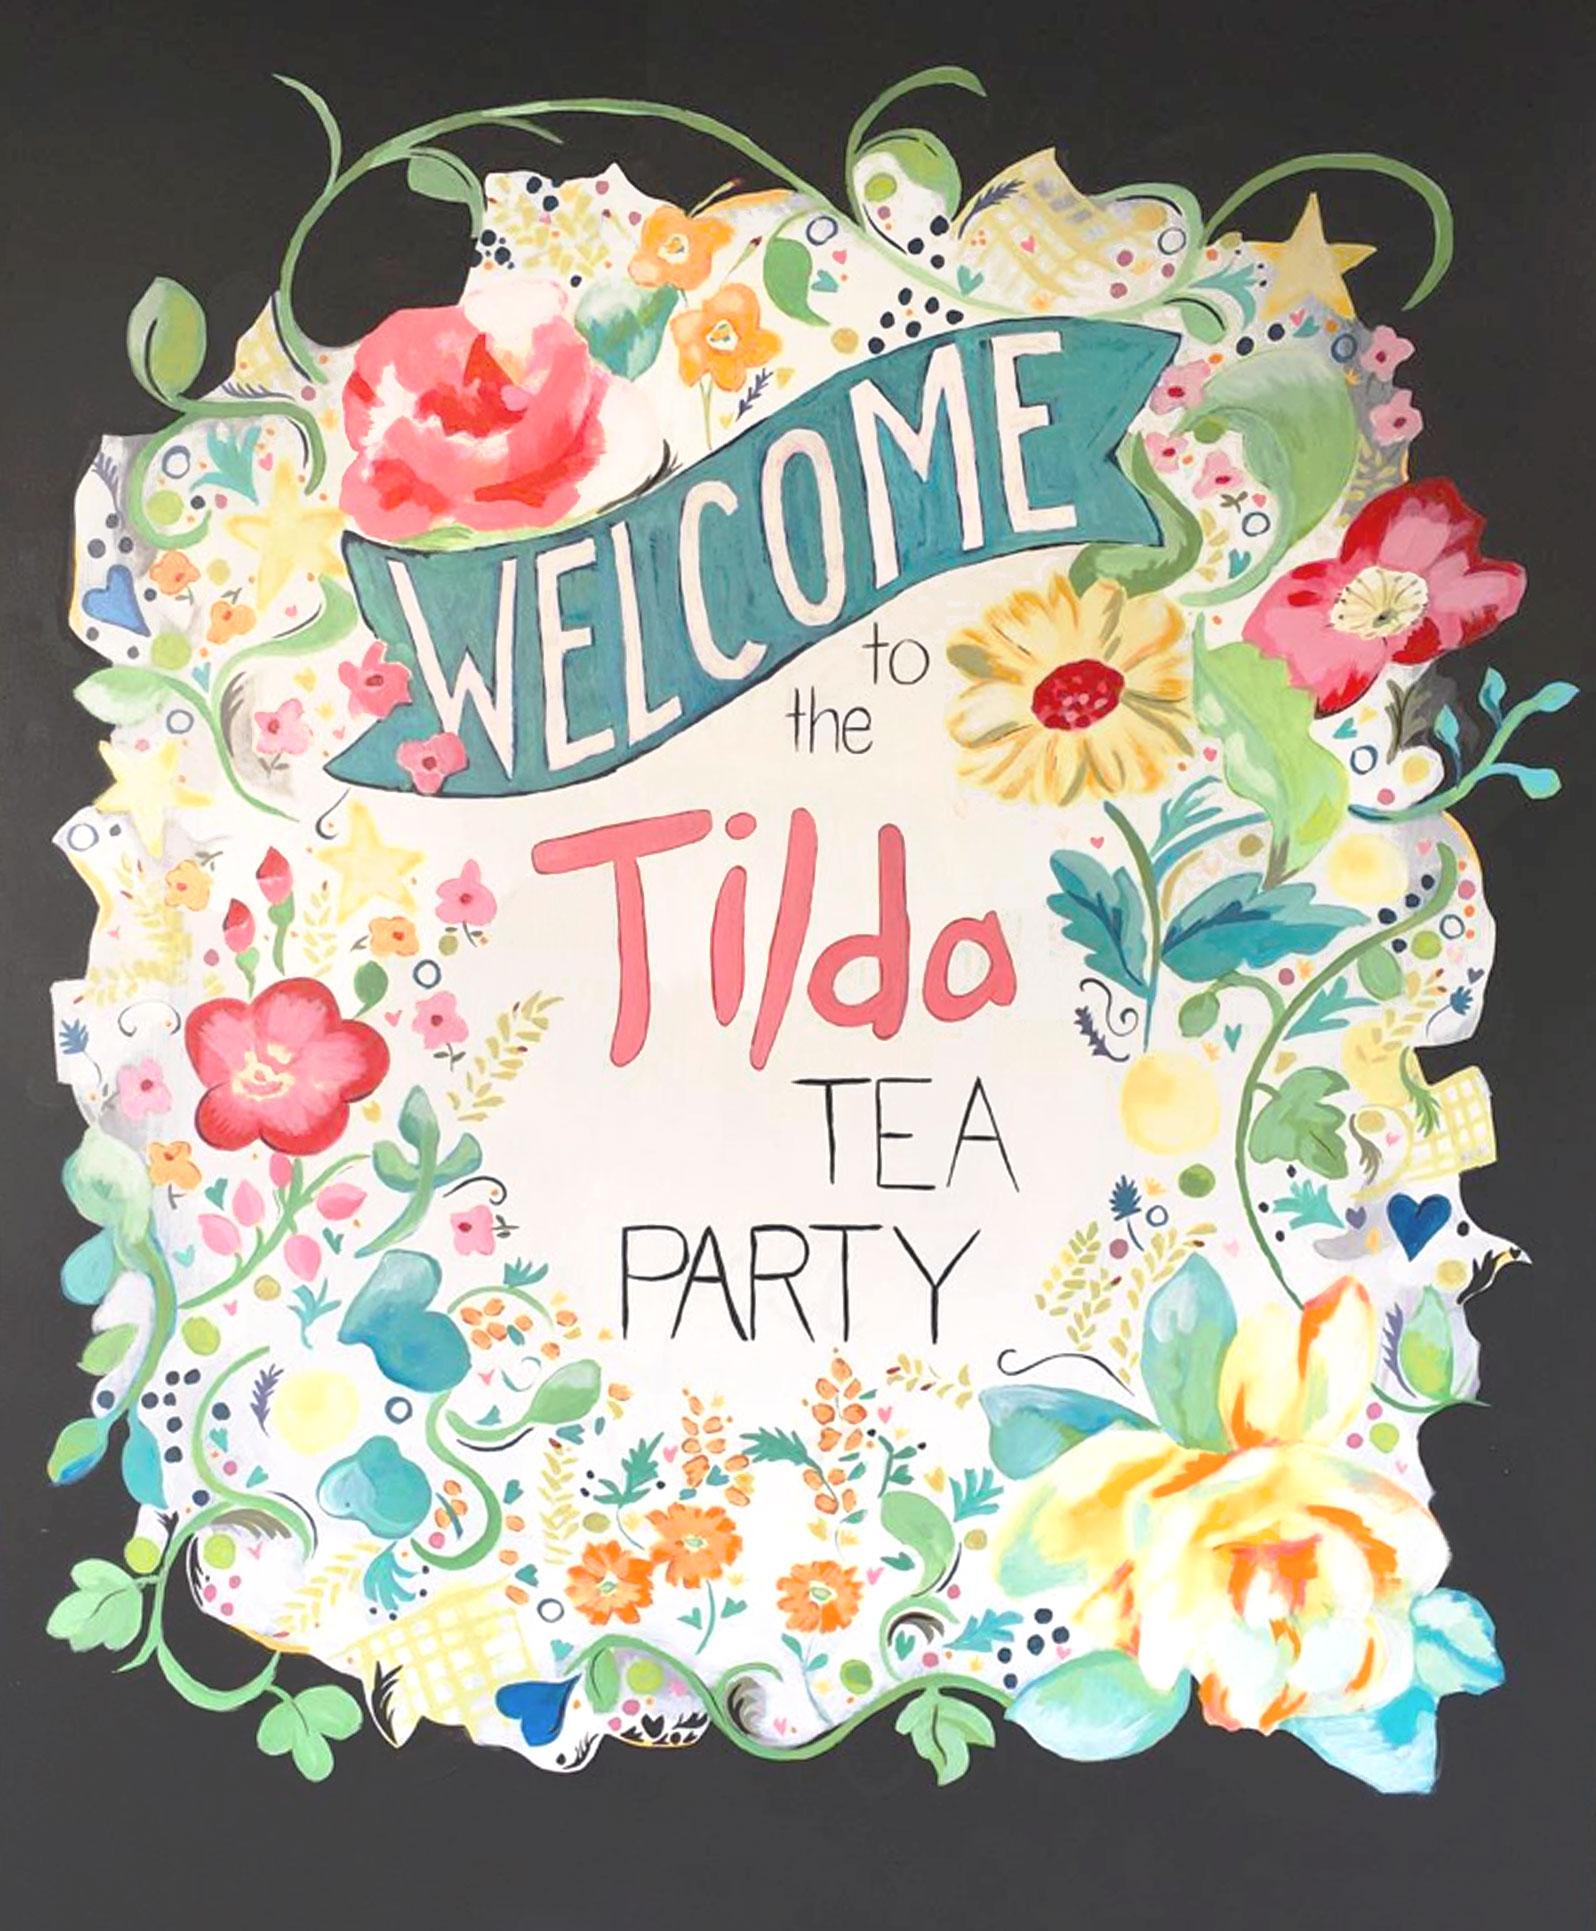 Tilda-Tea-Party